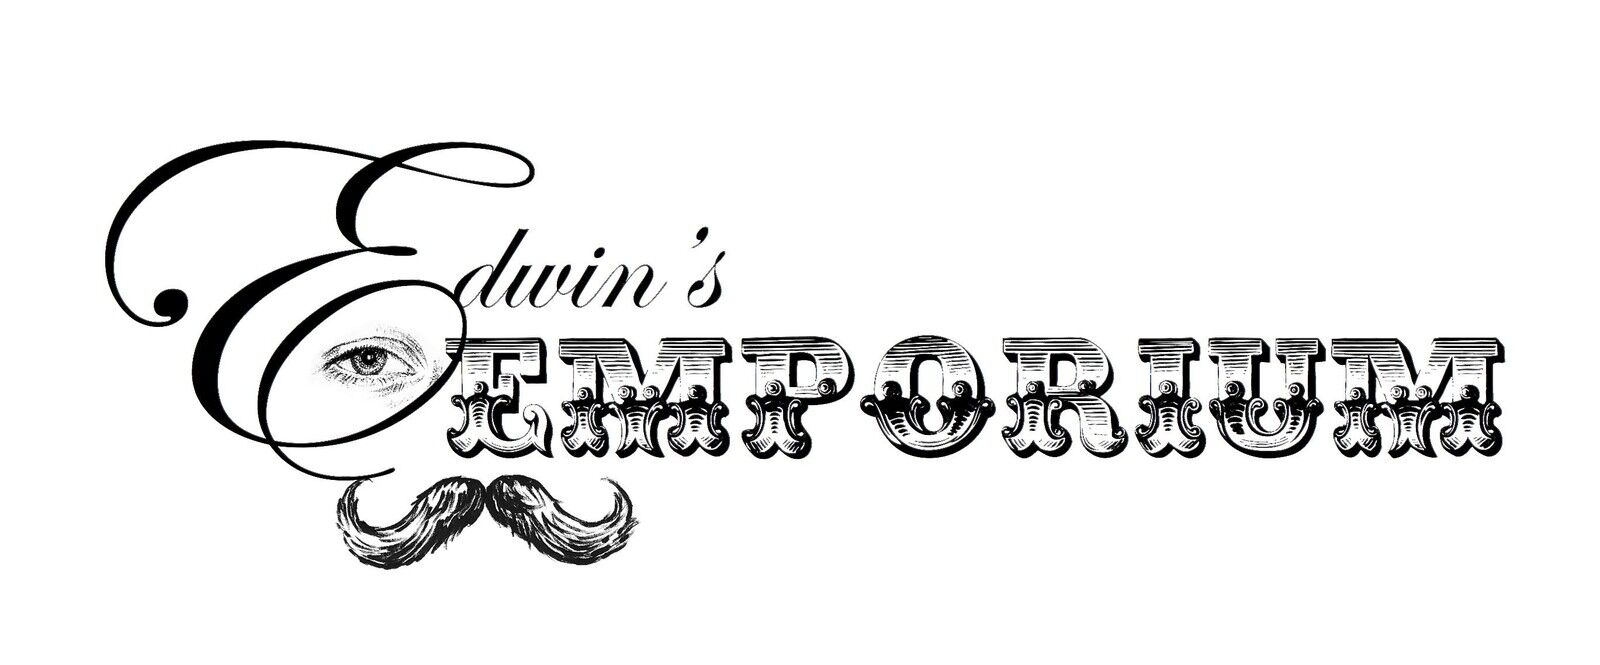 edwins-emporium